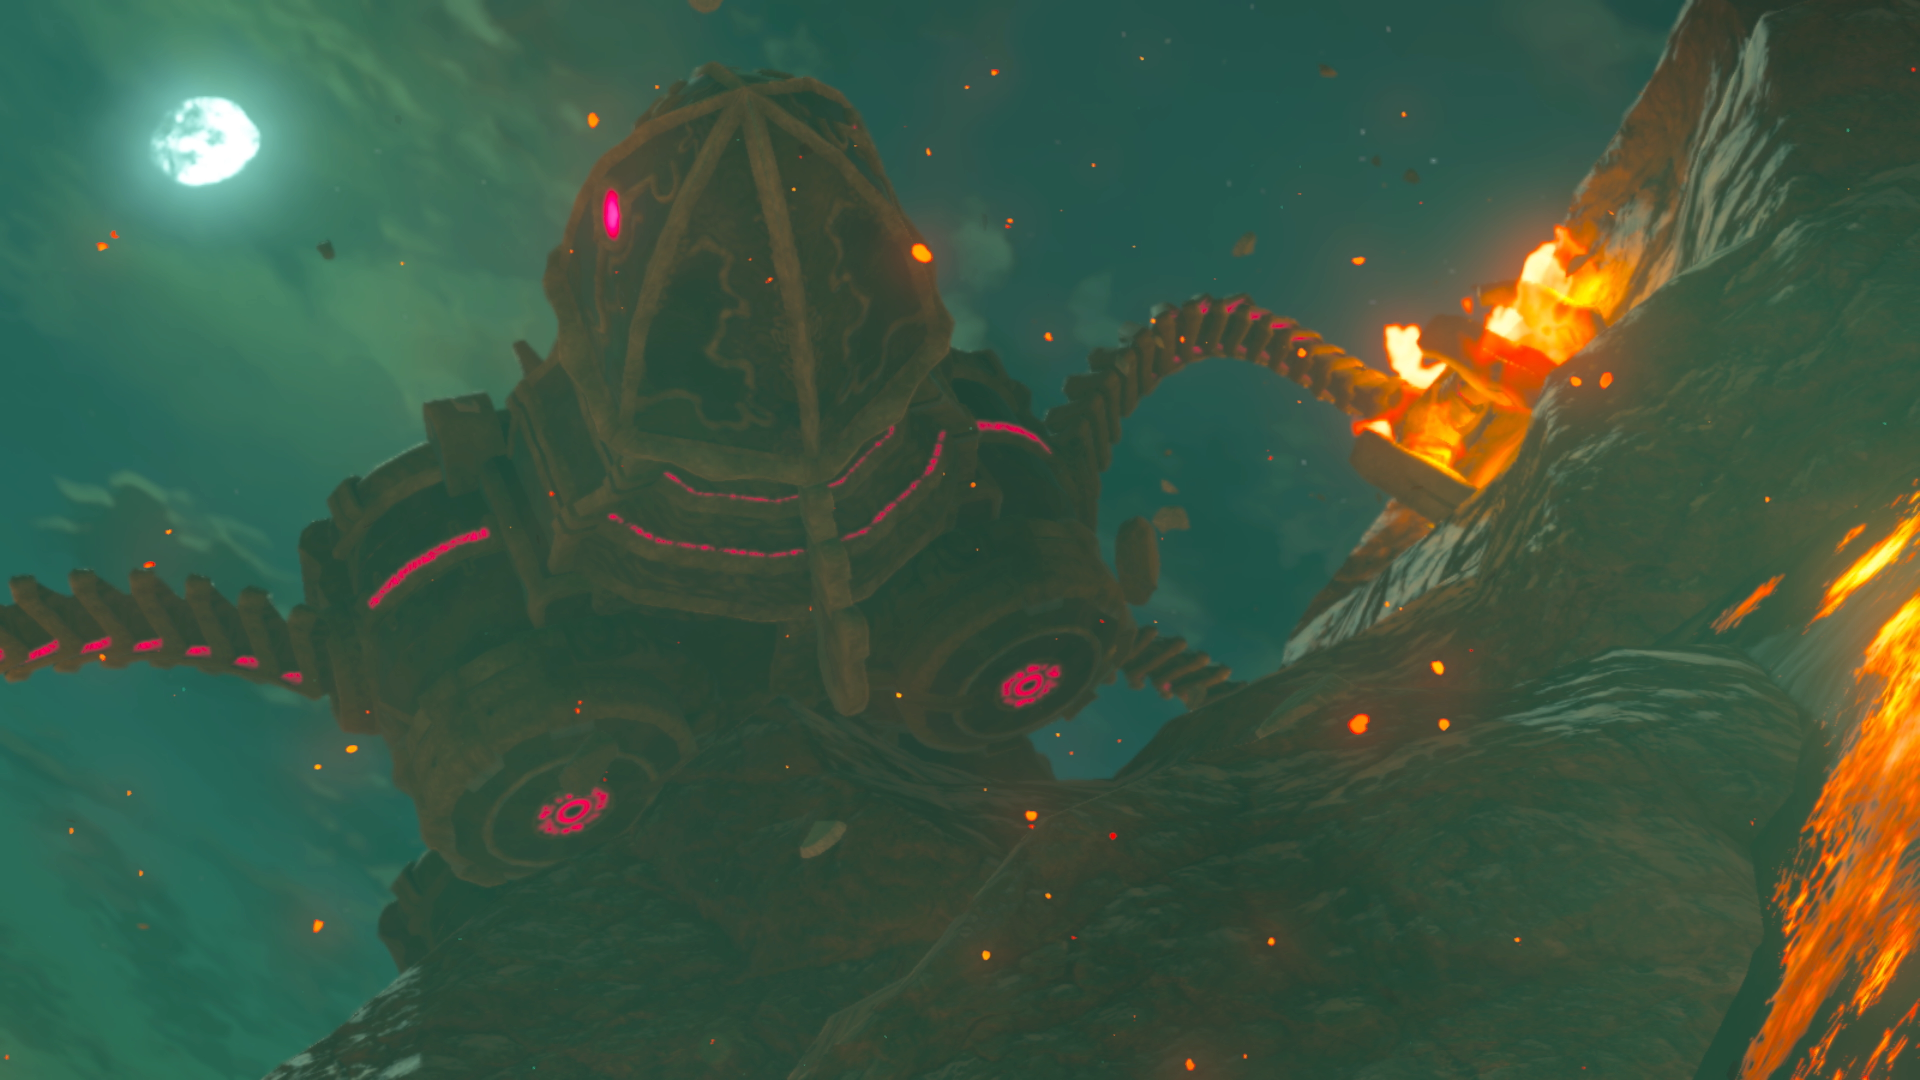 The Legend of Zelda: Breath of the Wild image 7